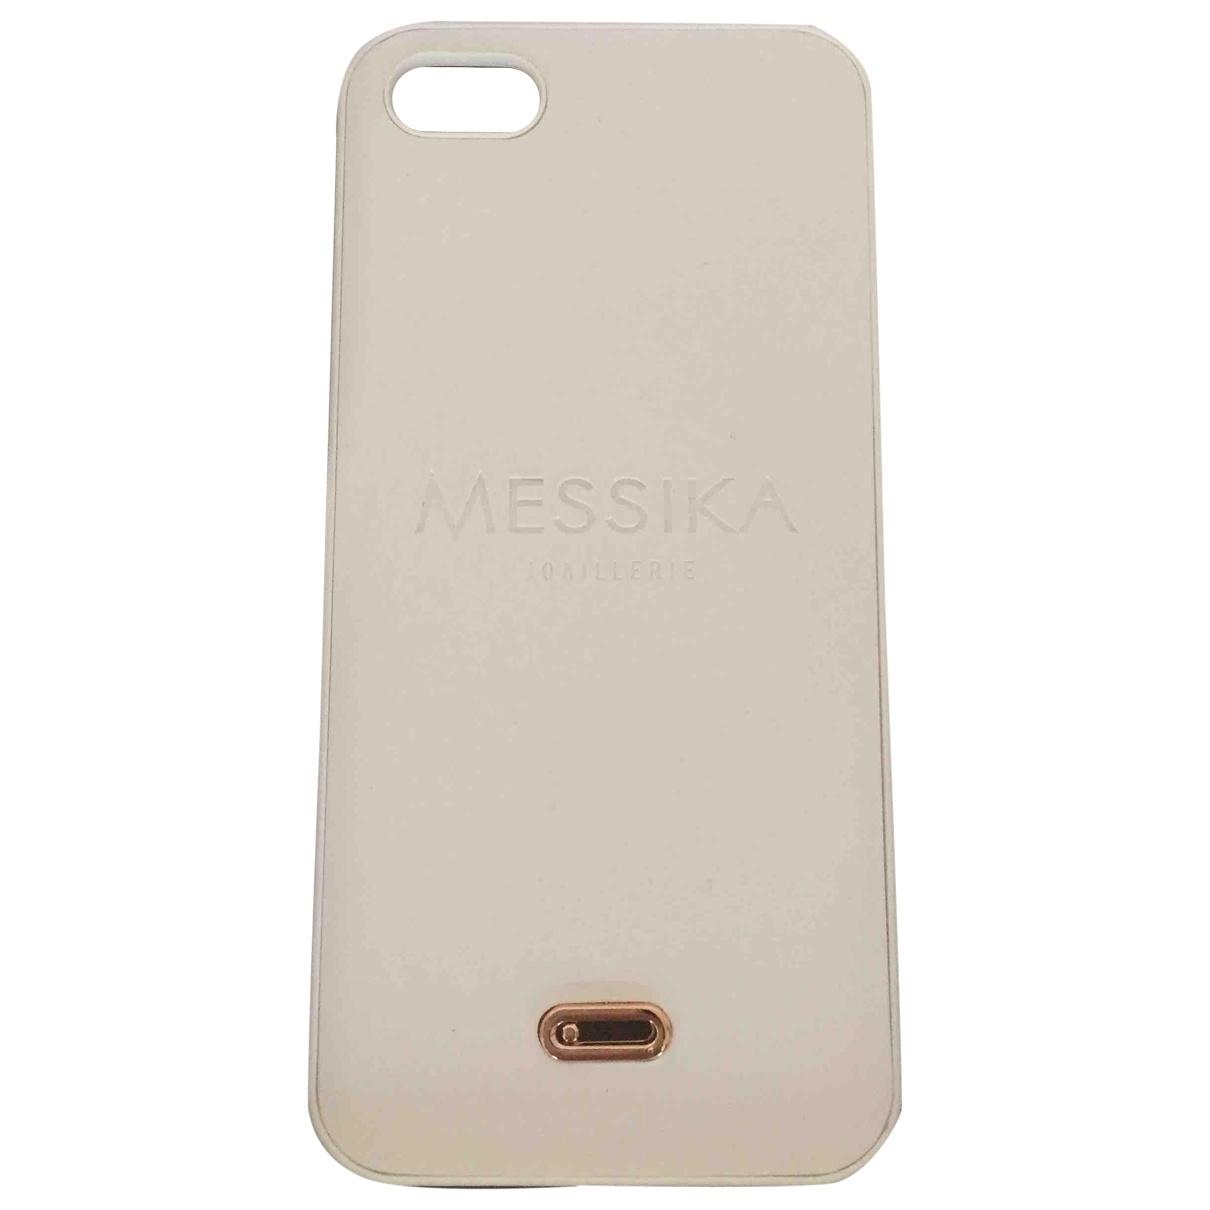 Funda iphone Messika